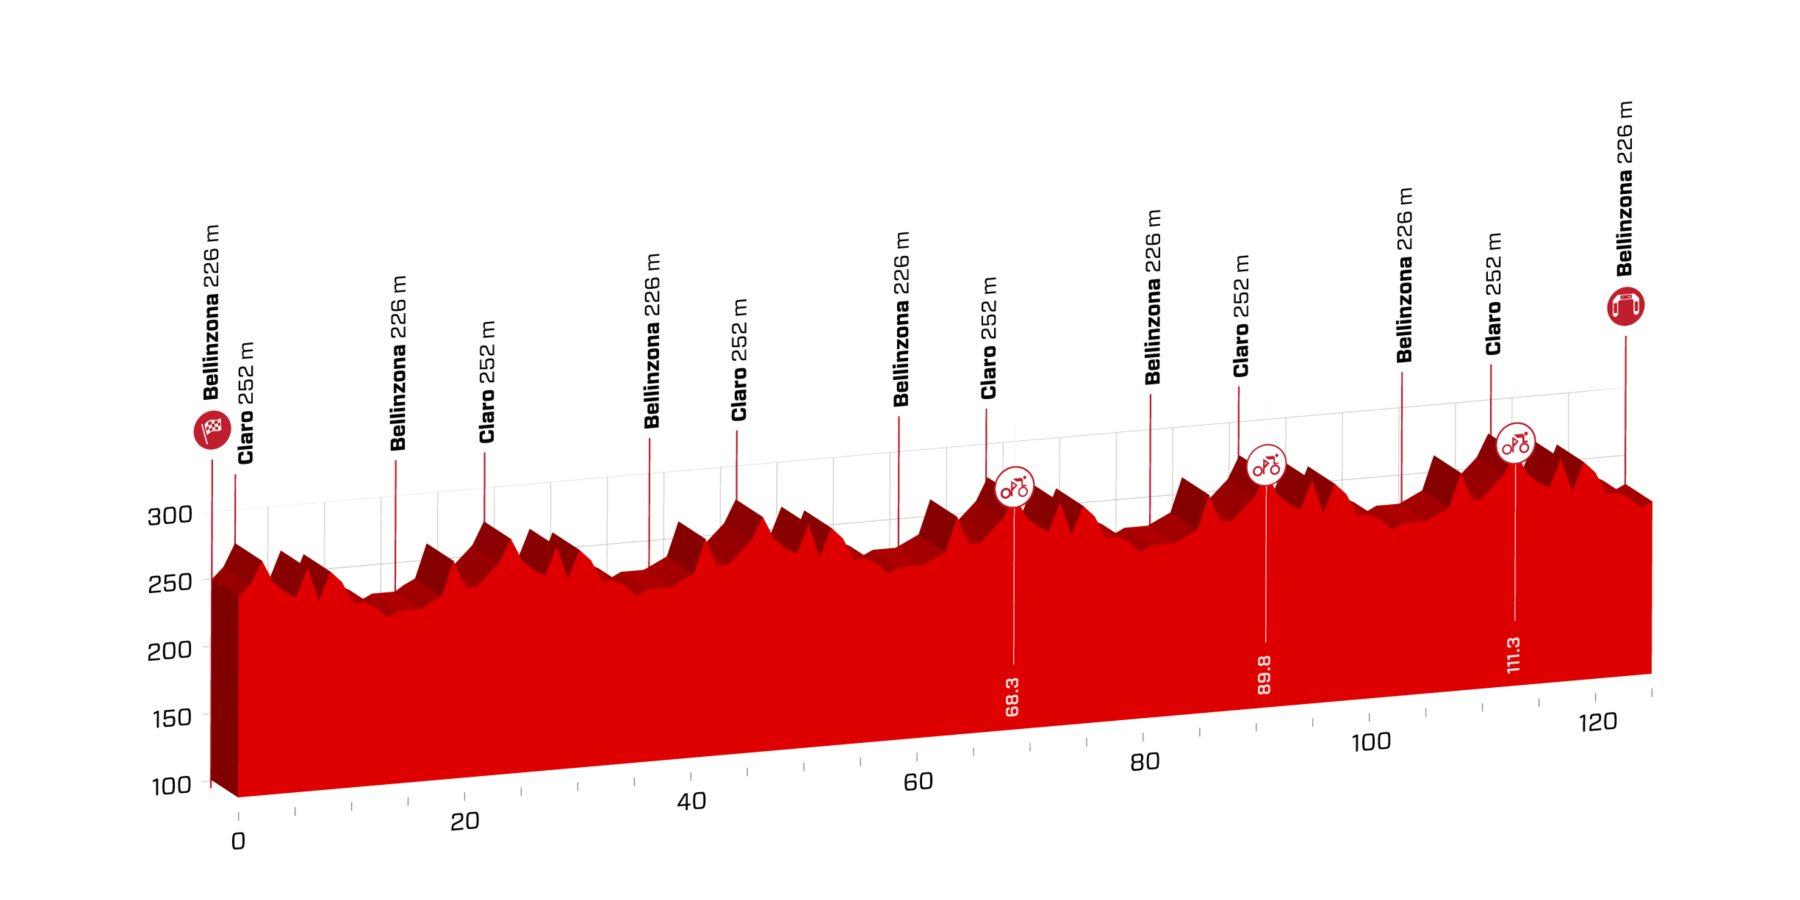 Circuito Bellinzona. 123 kms.